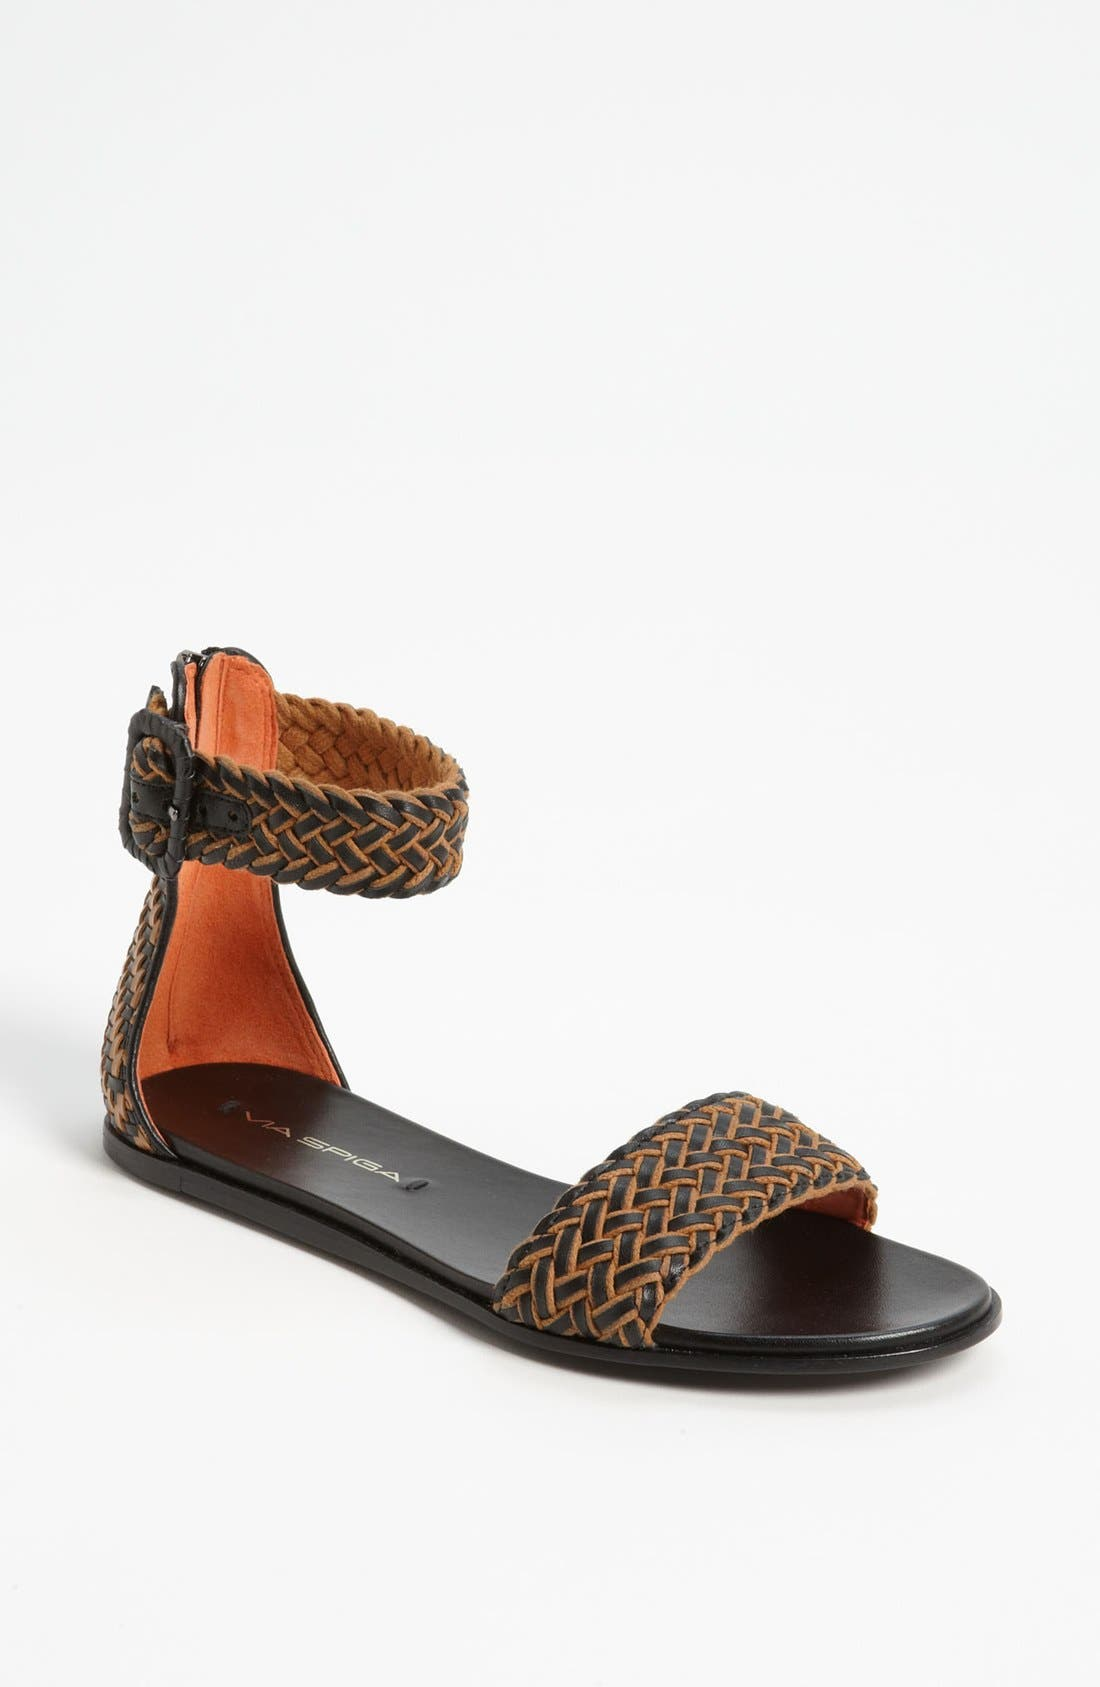 Alternate Image 1 Selected - Via Spiga 'Wenda' Sandal